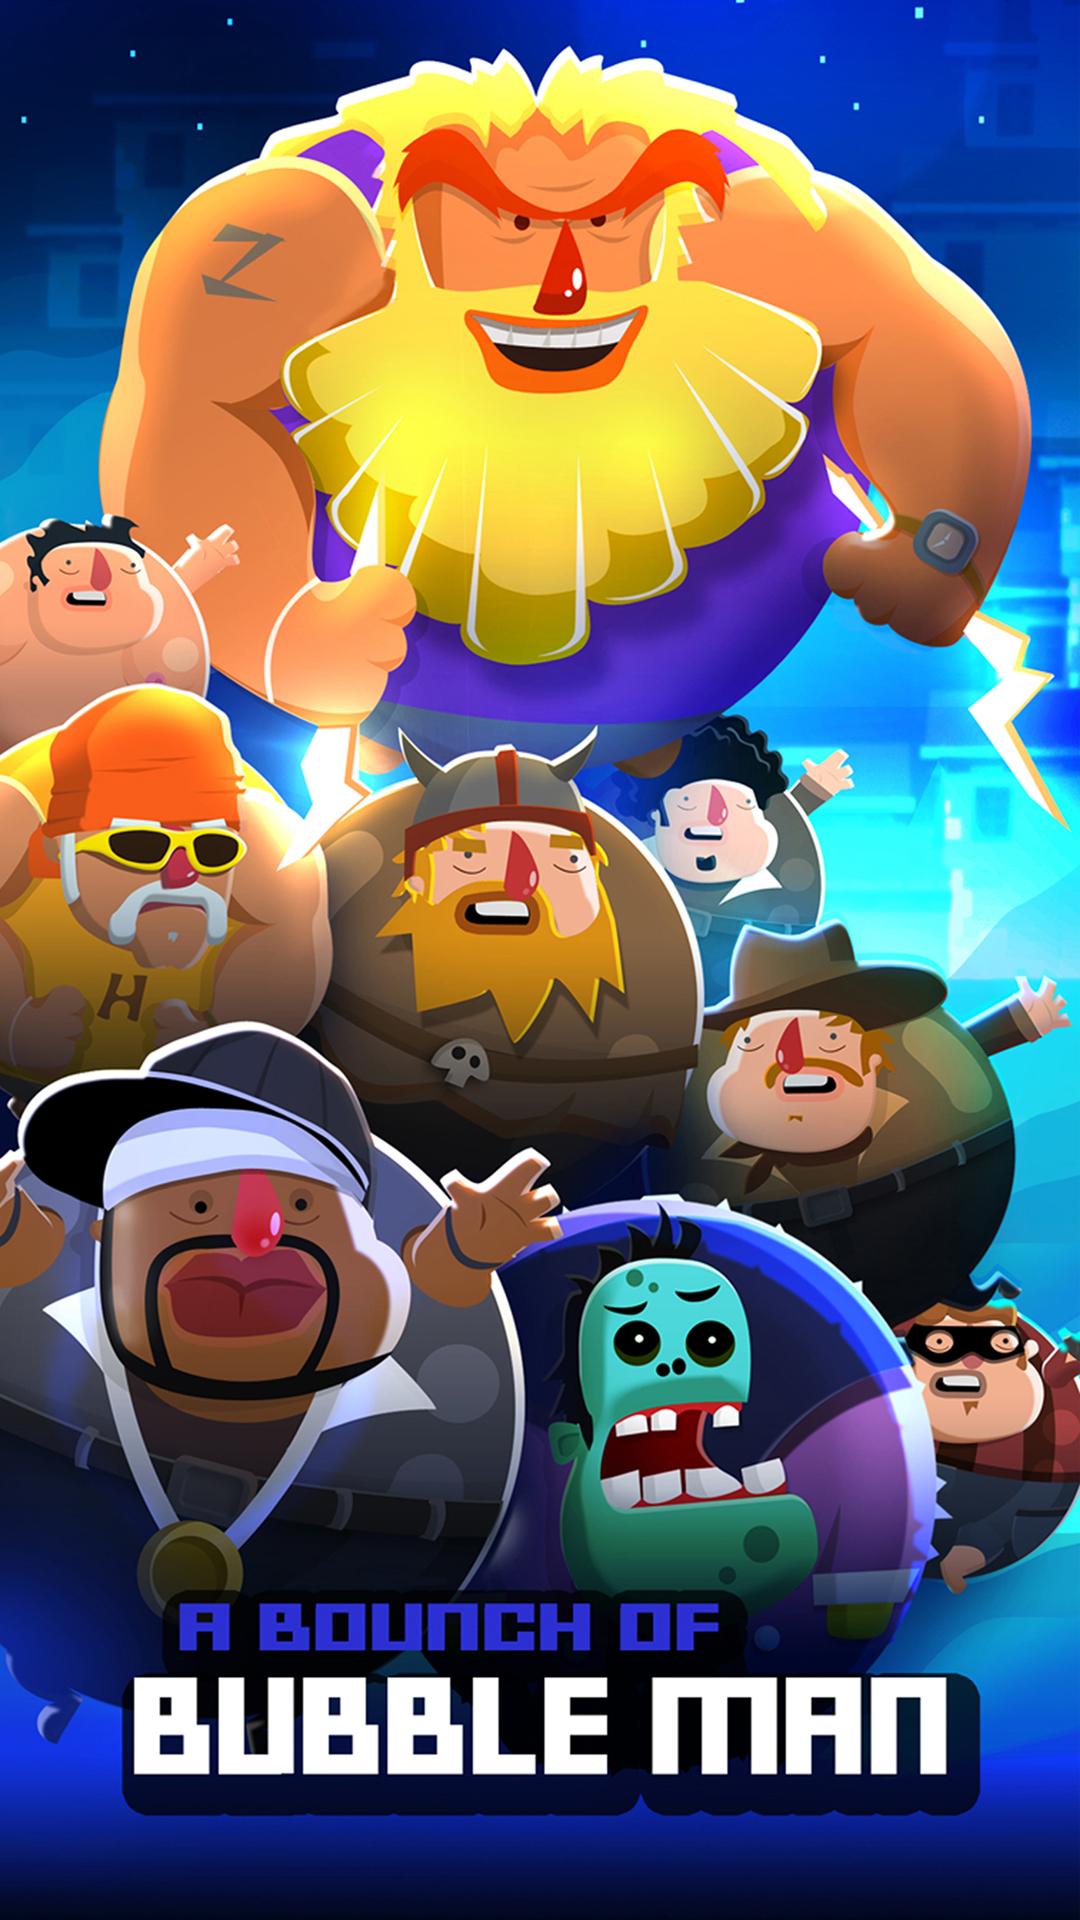 Bubble Man: Rises: Amazon.es: Appstore para Android